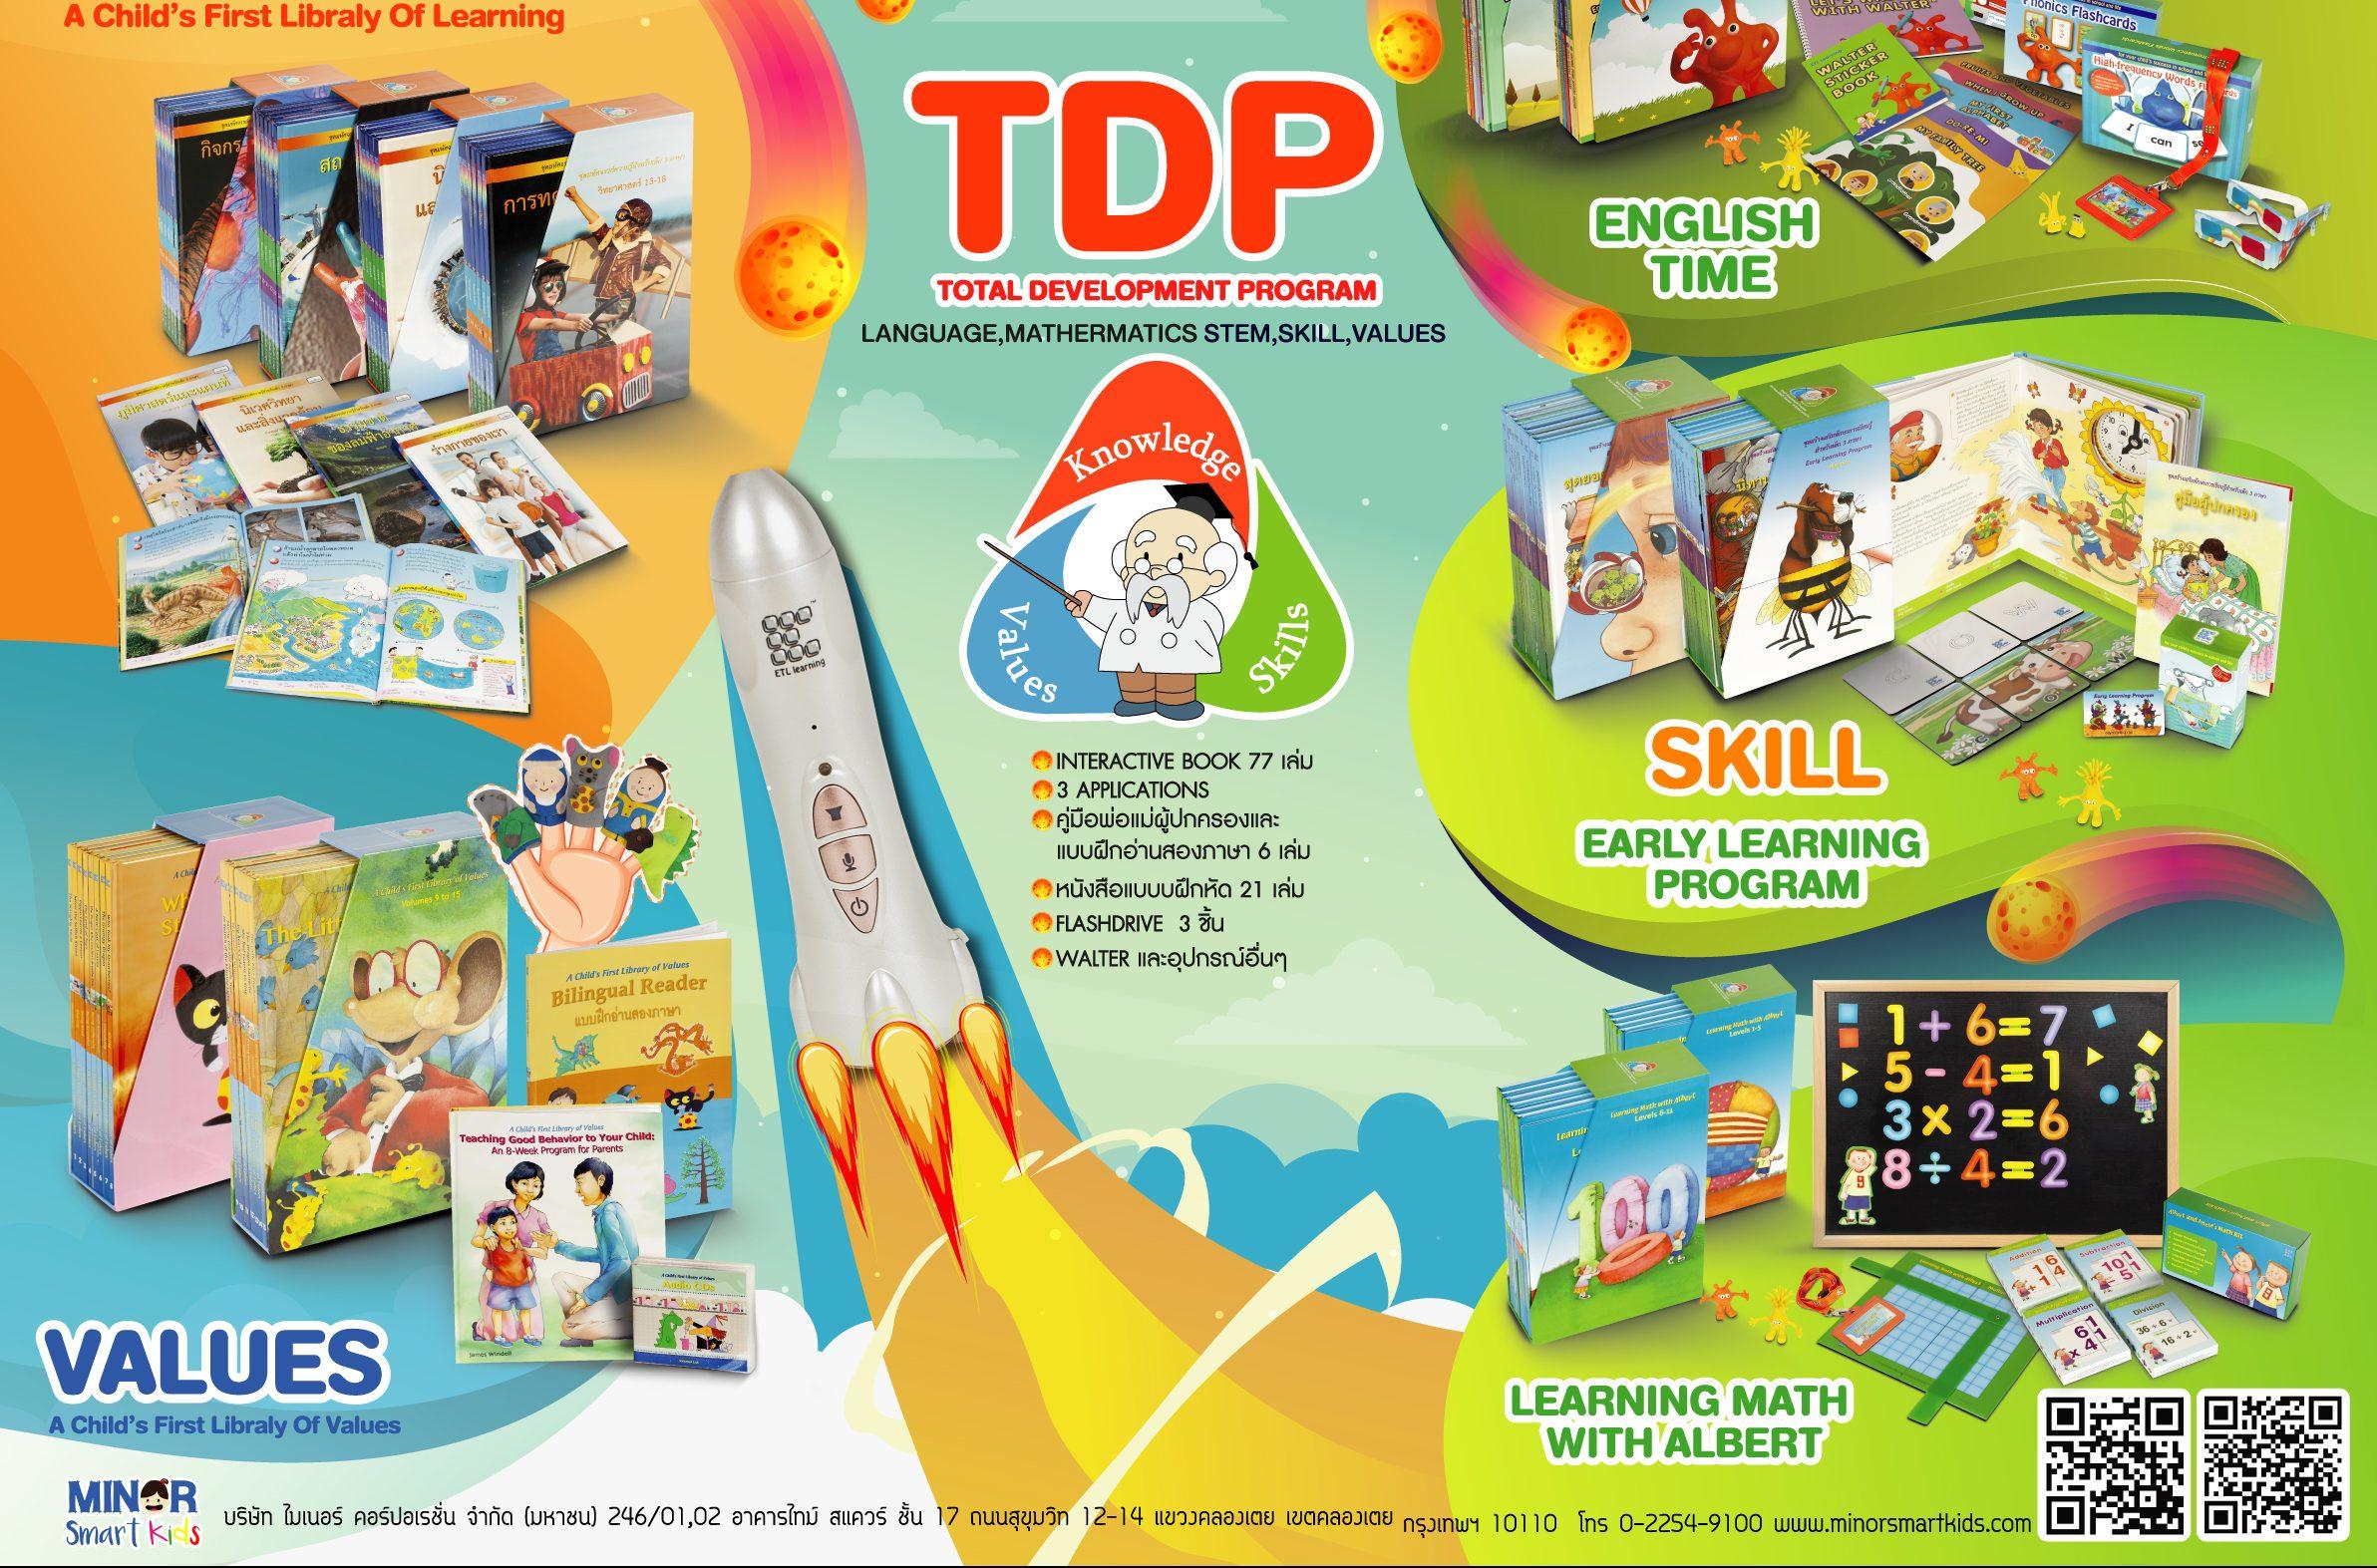 The Total Development Program